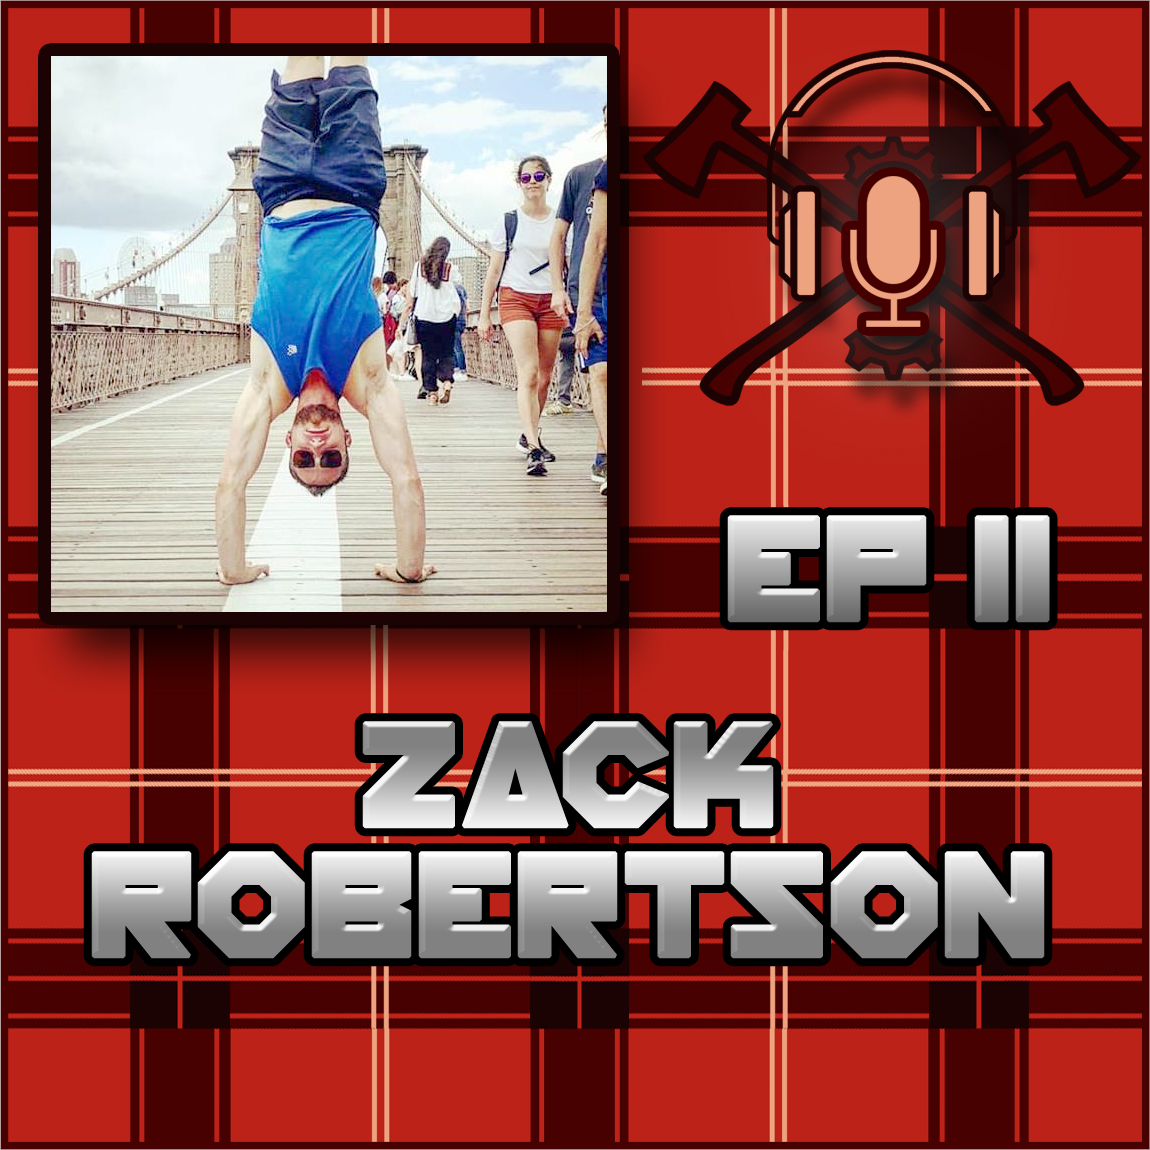 Episode 11 Zack Robertson